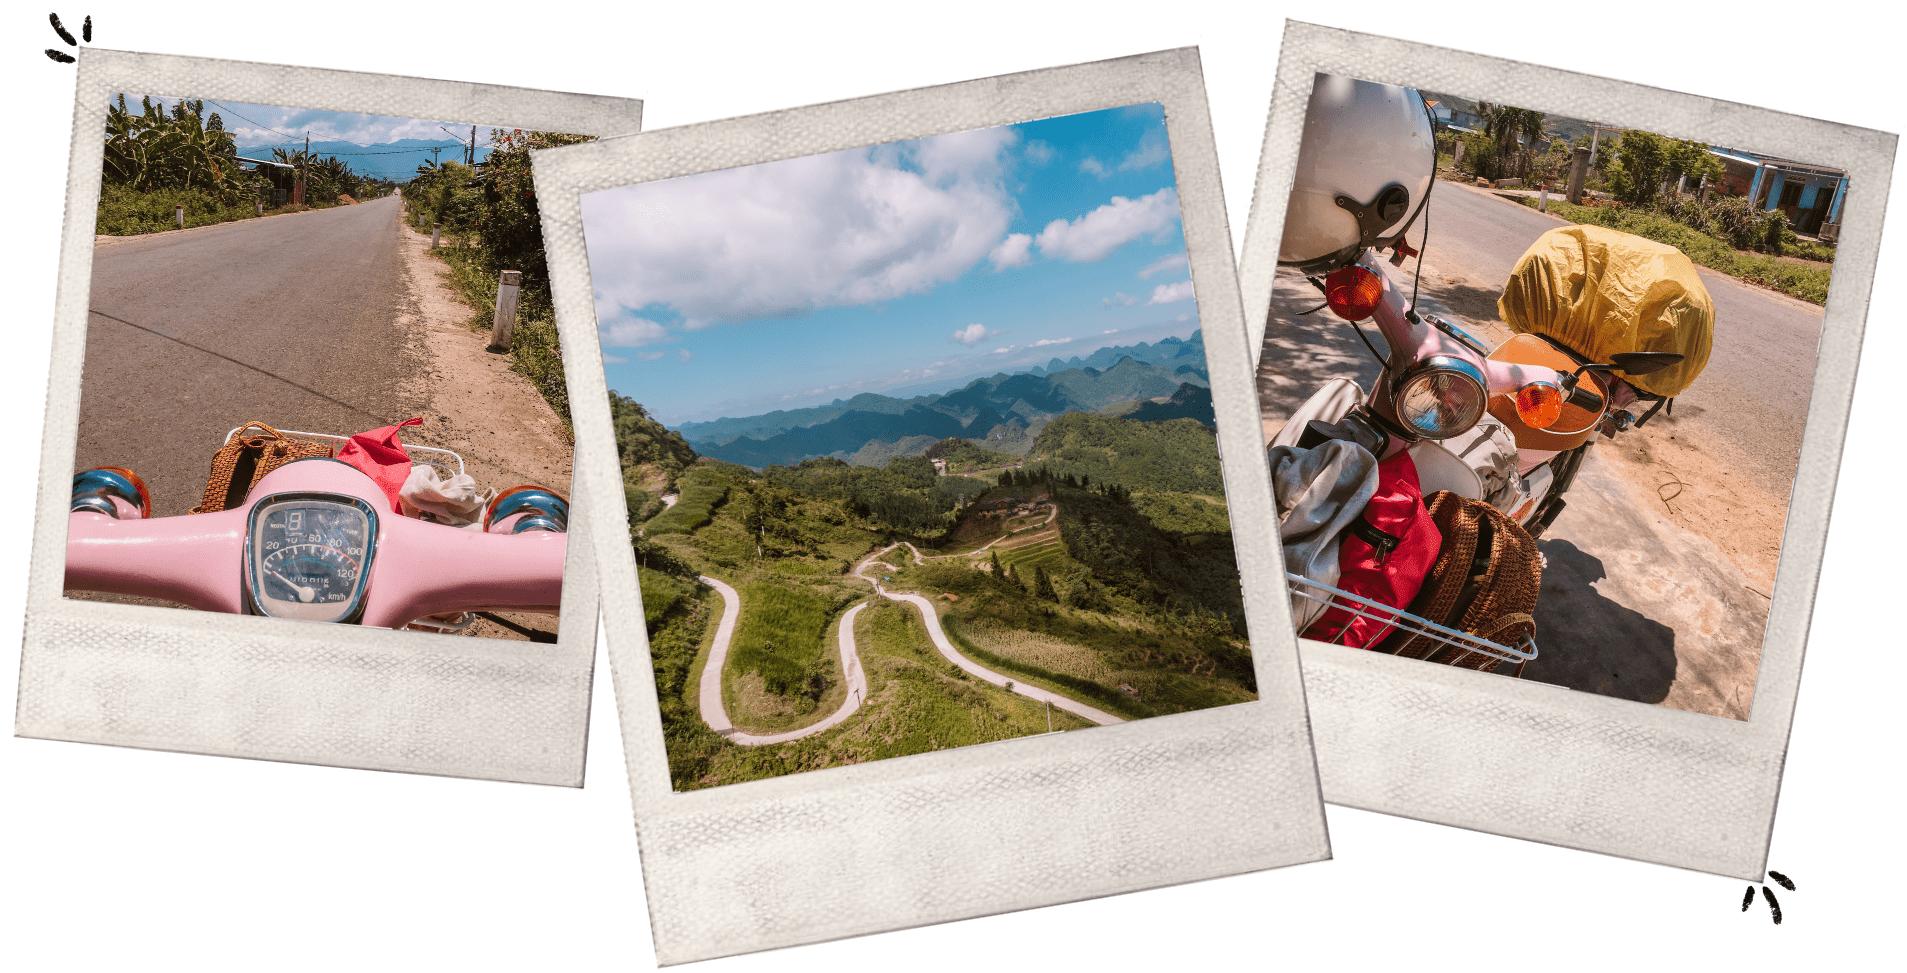 tips for motorbiking in Vietnam